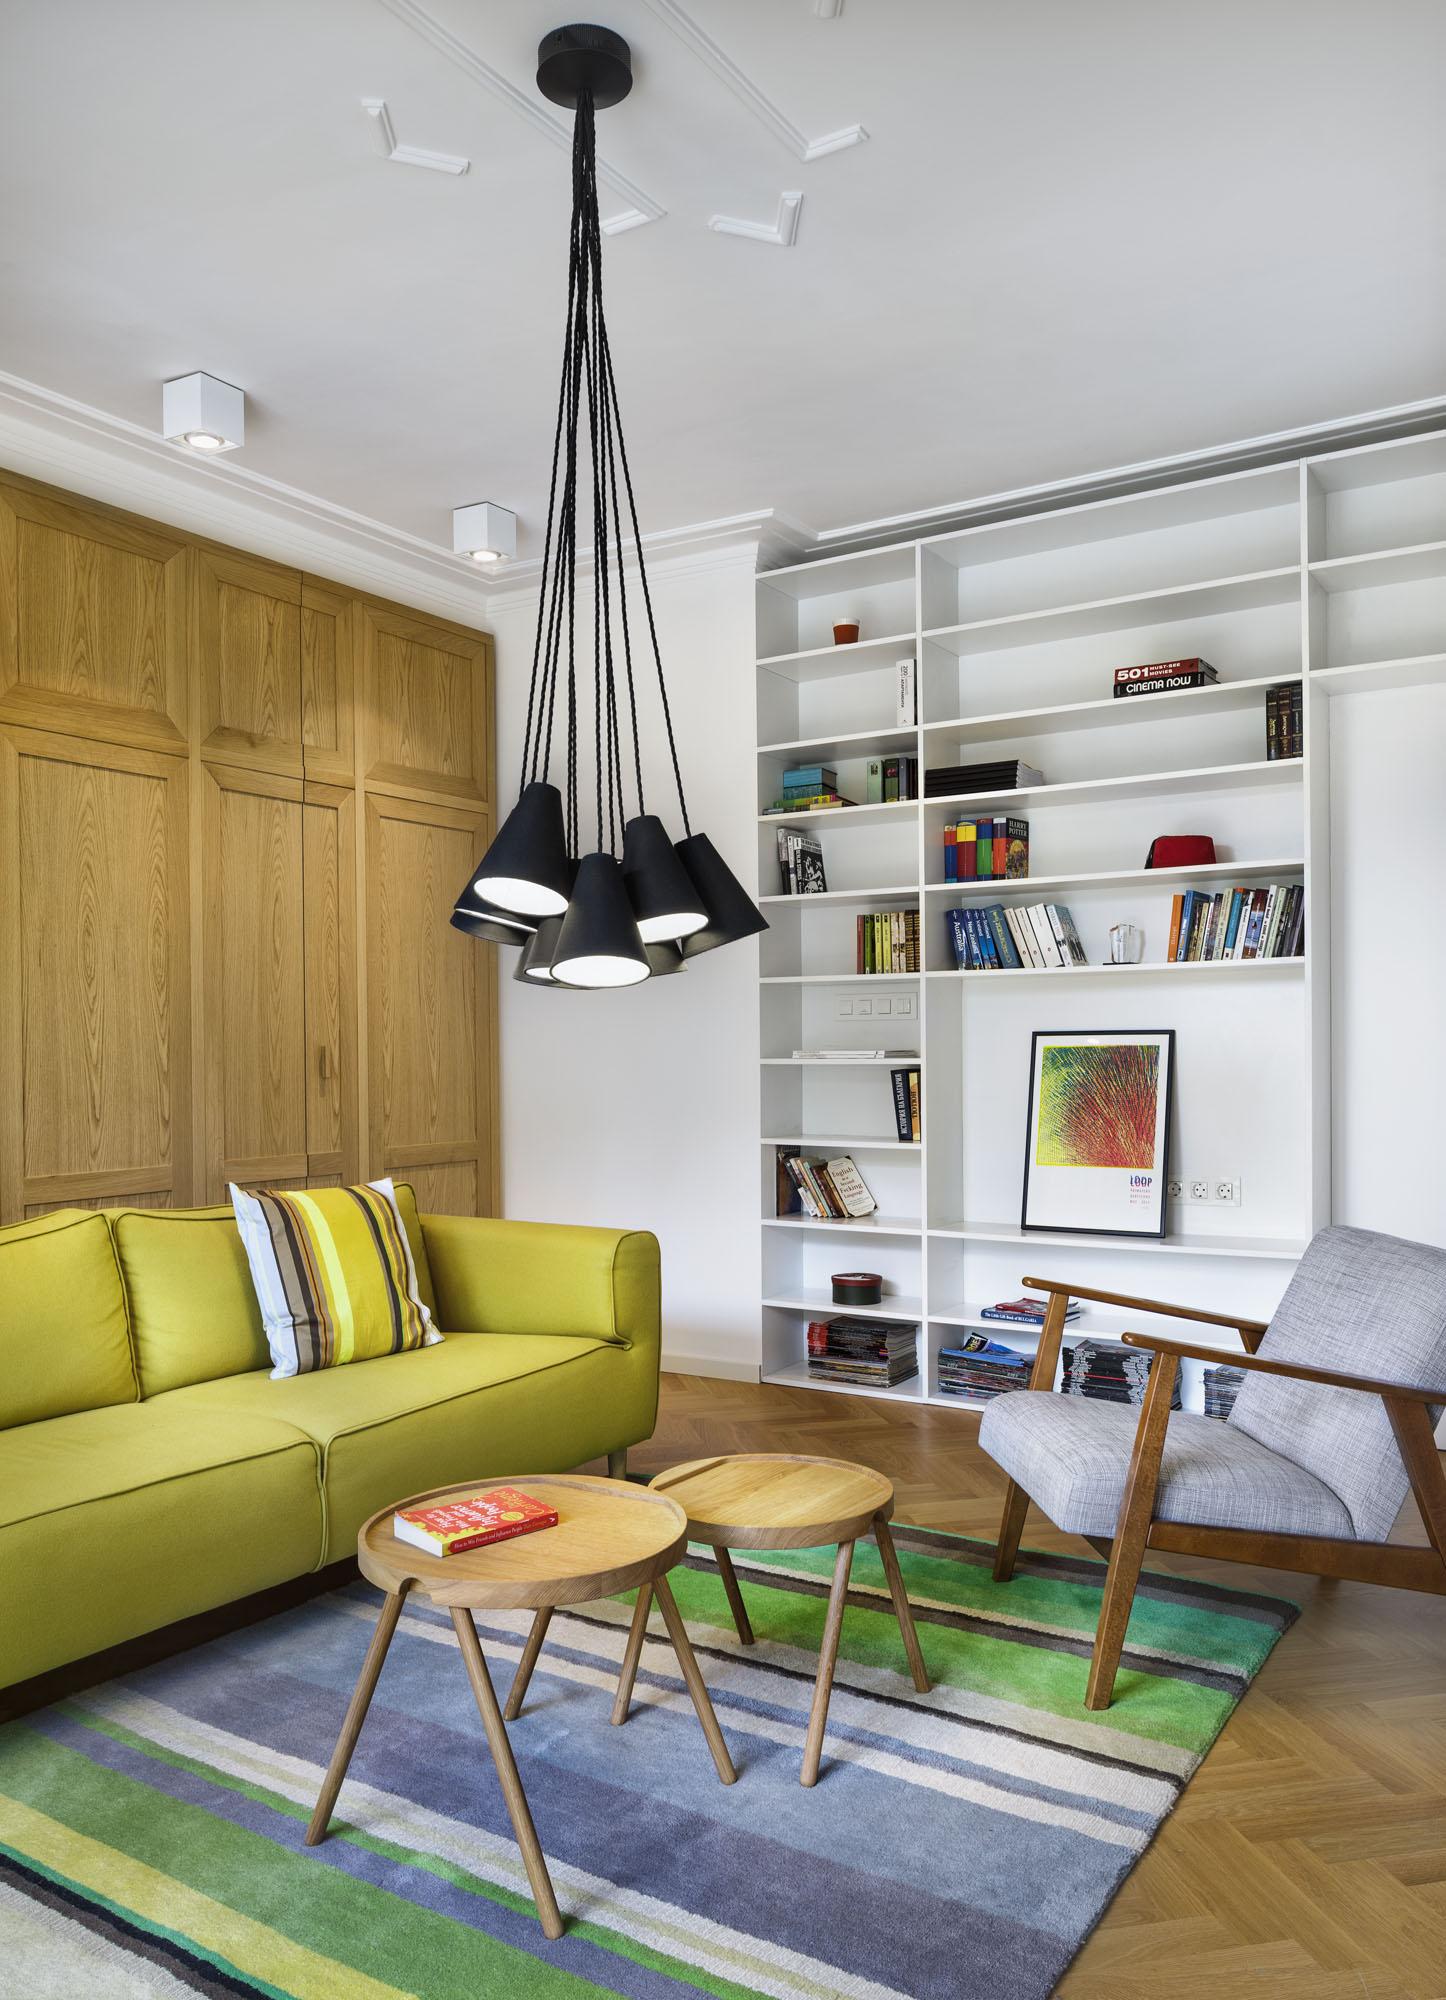 Chic Apartment H01 in Sofia by DontDIY Studio-05